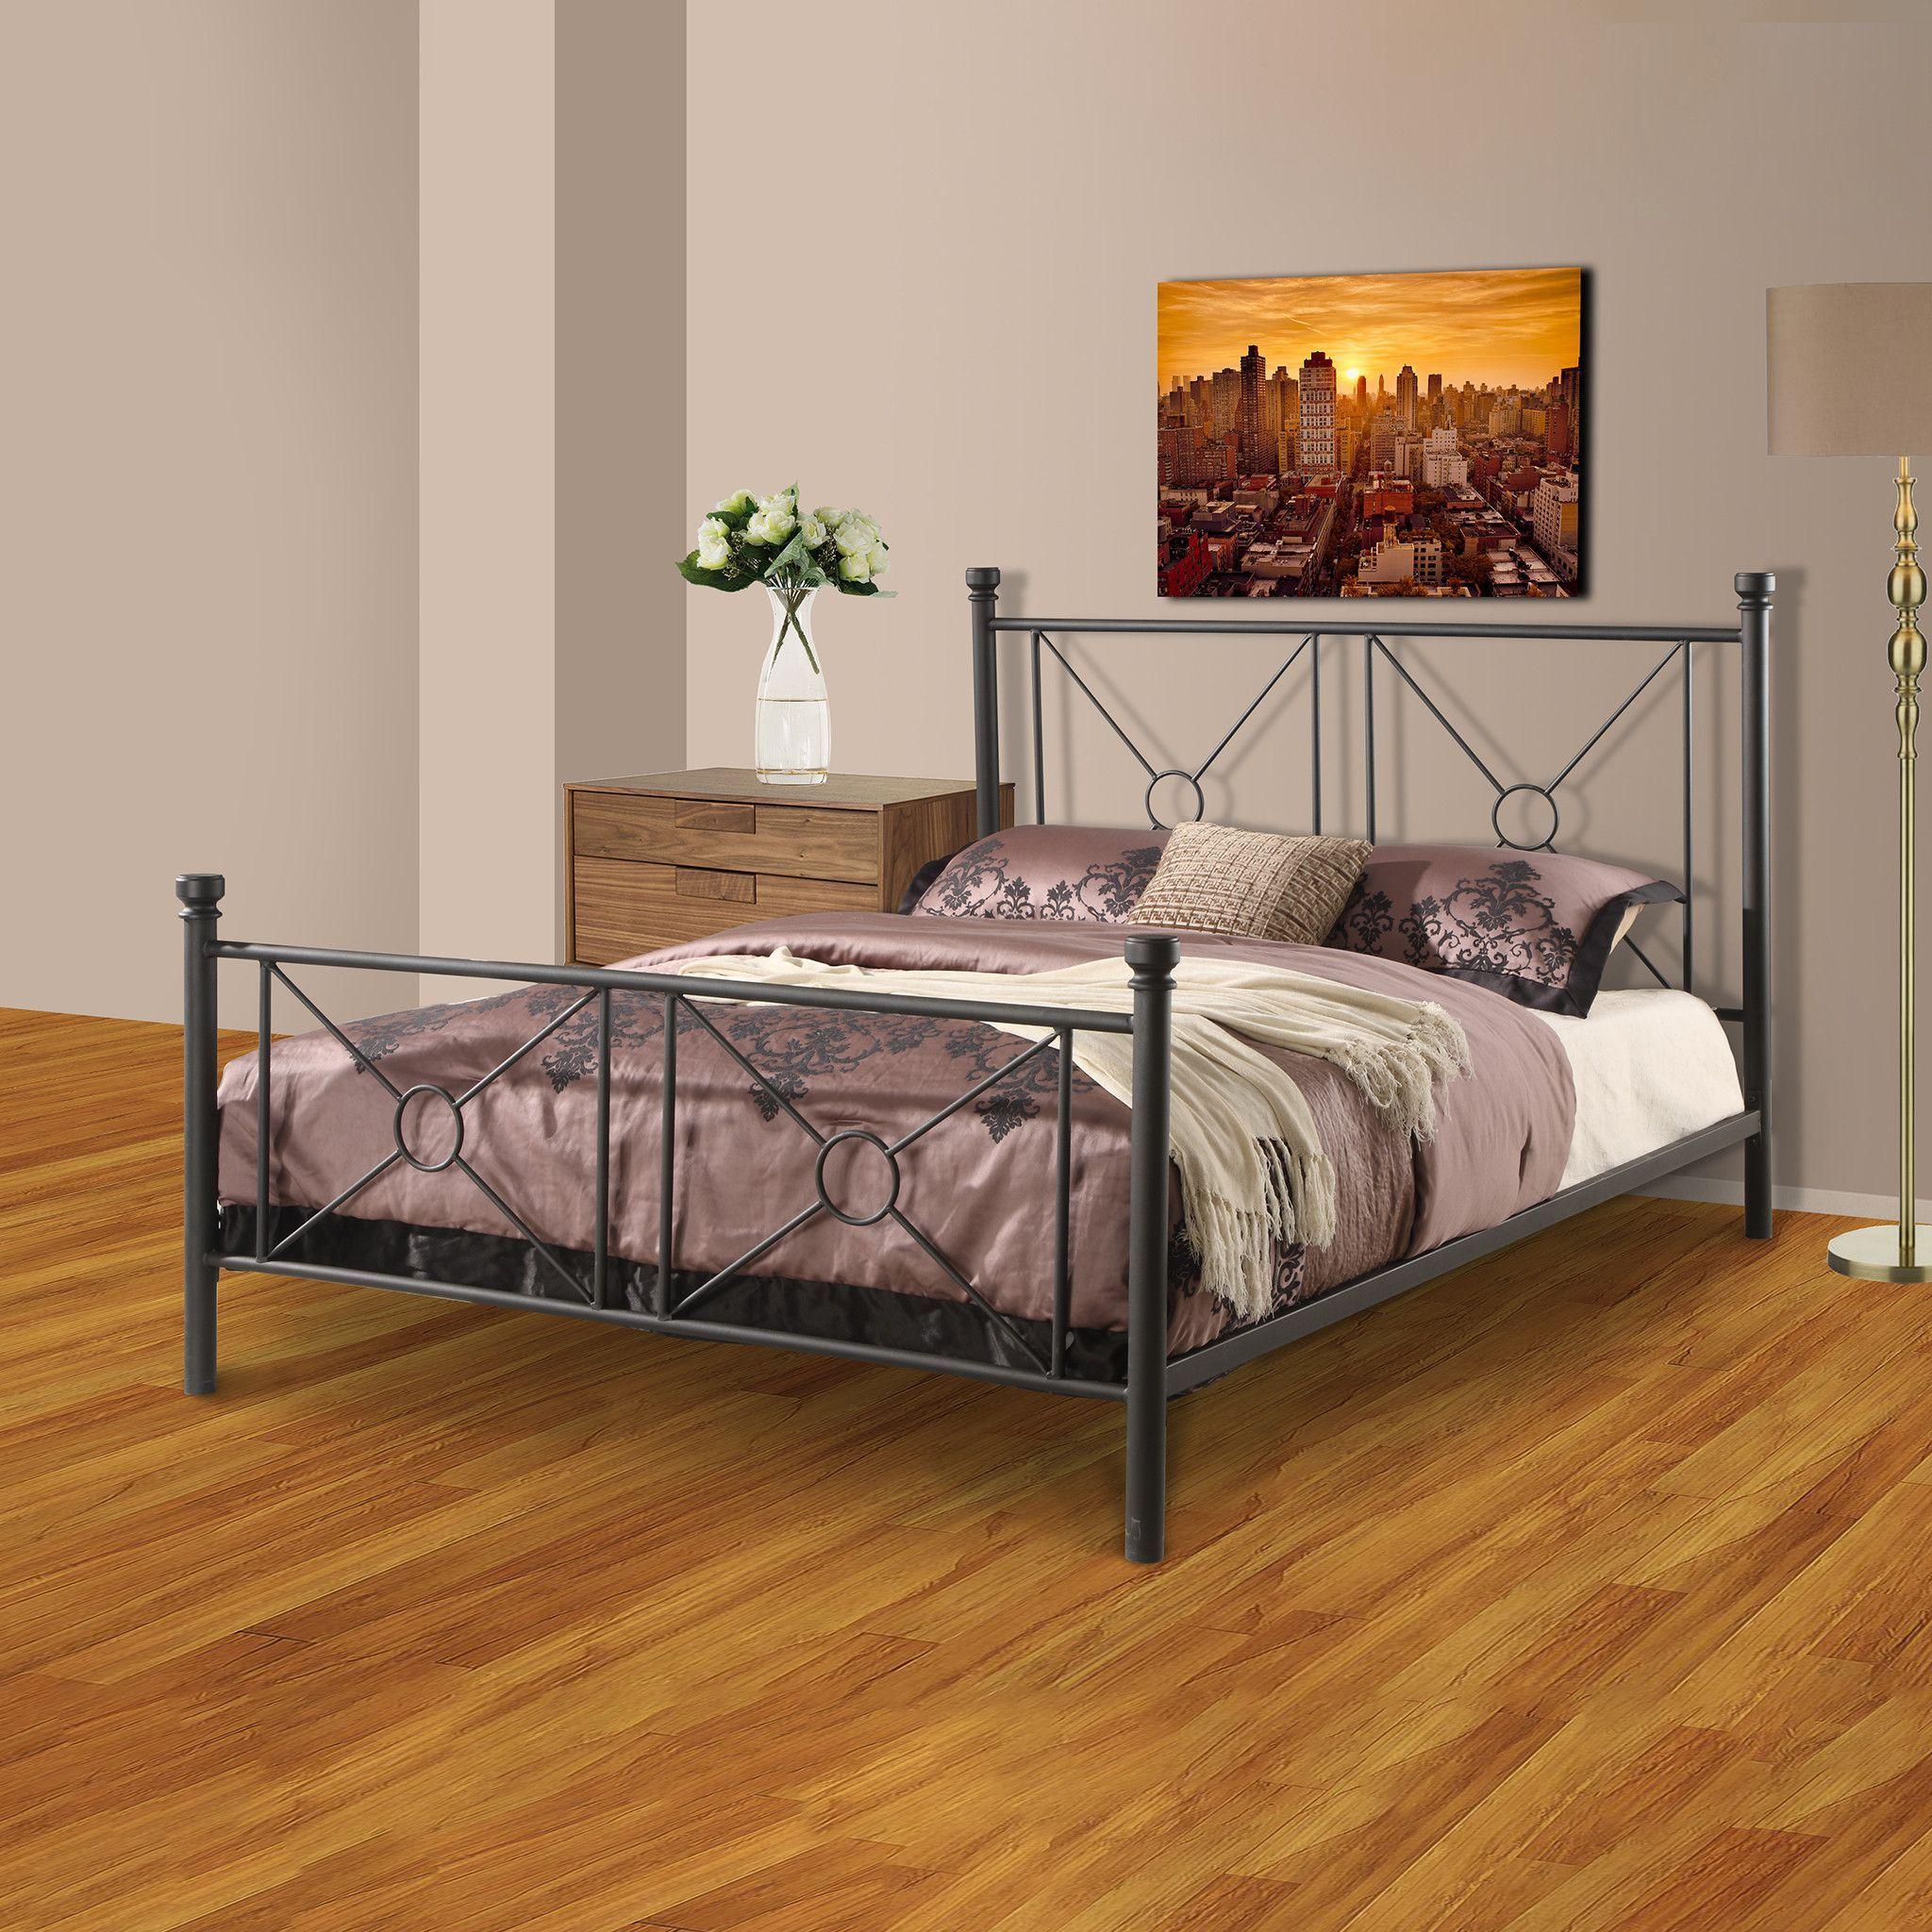 Pilaster Designs - Matte Black Metal Full Size Bed Headboard Footboard Rails & Metal Slats